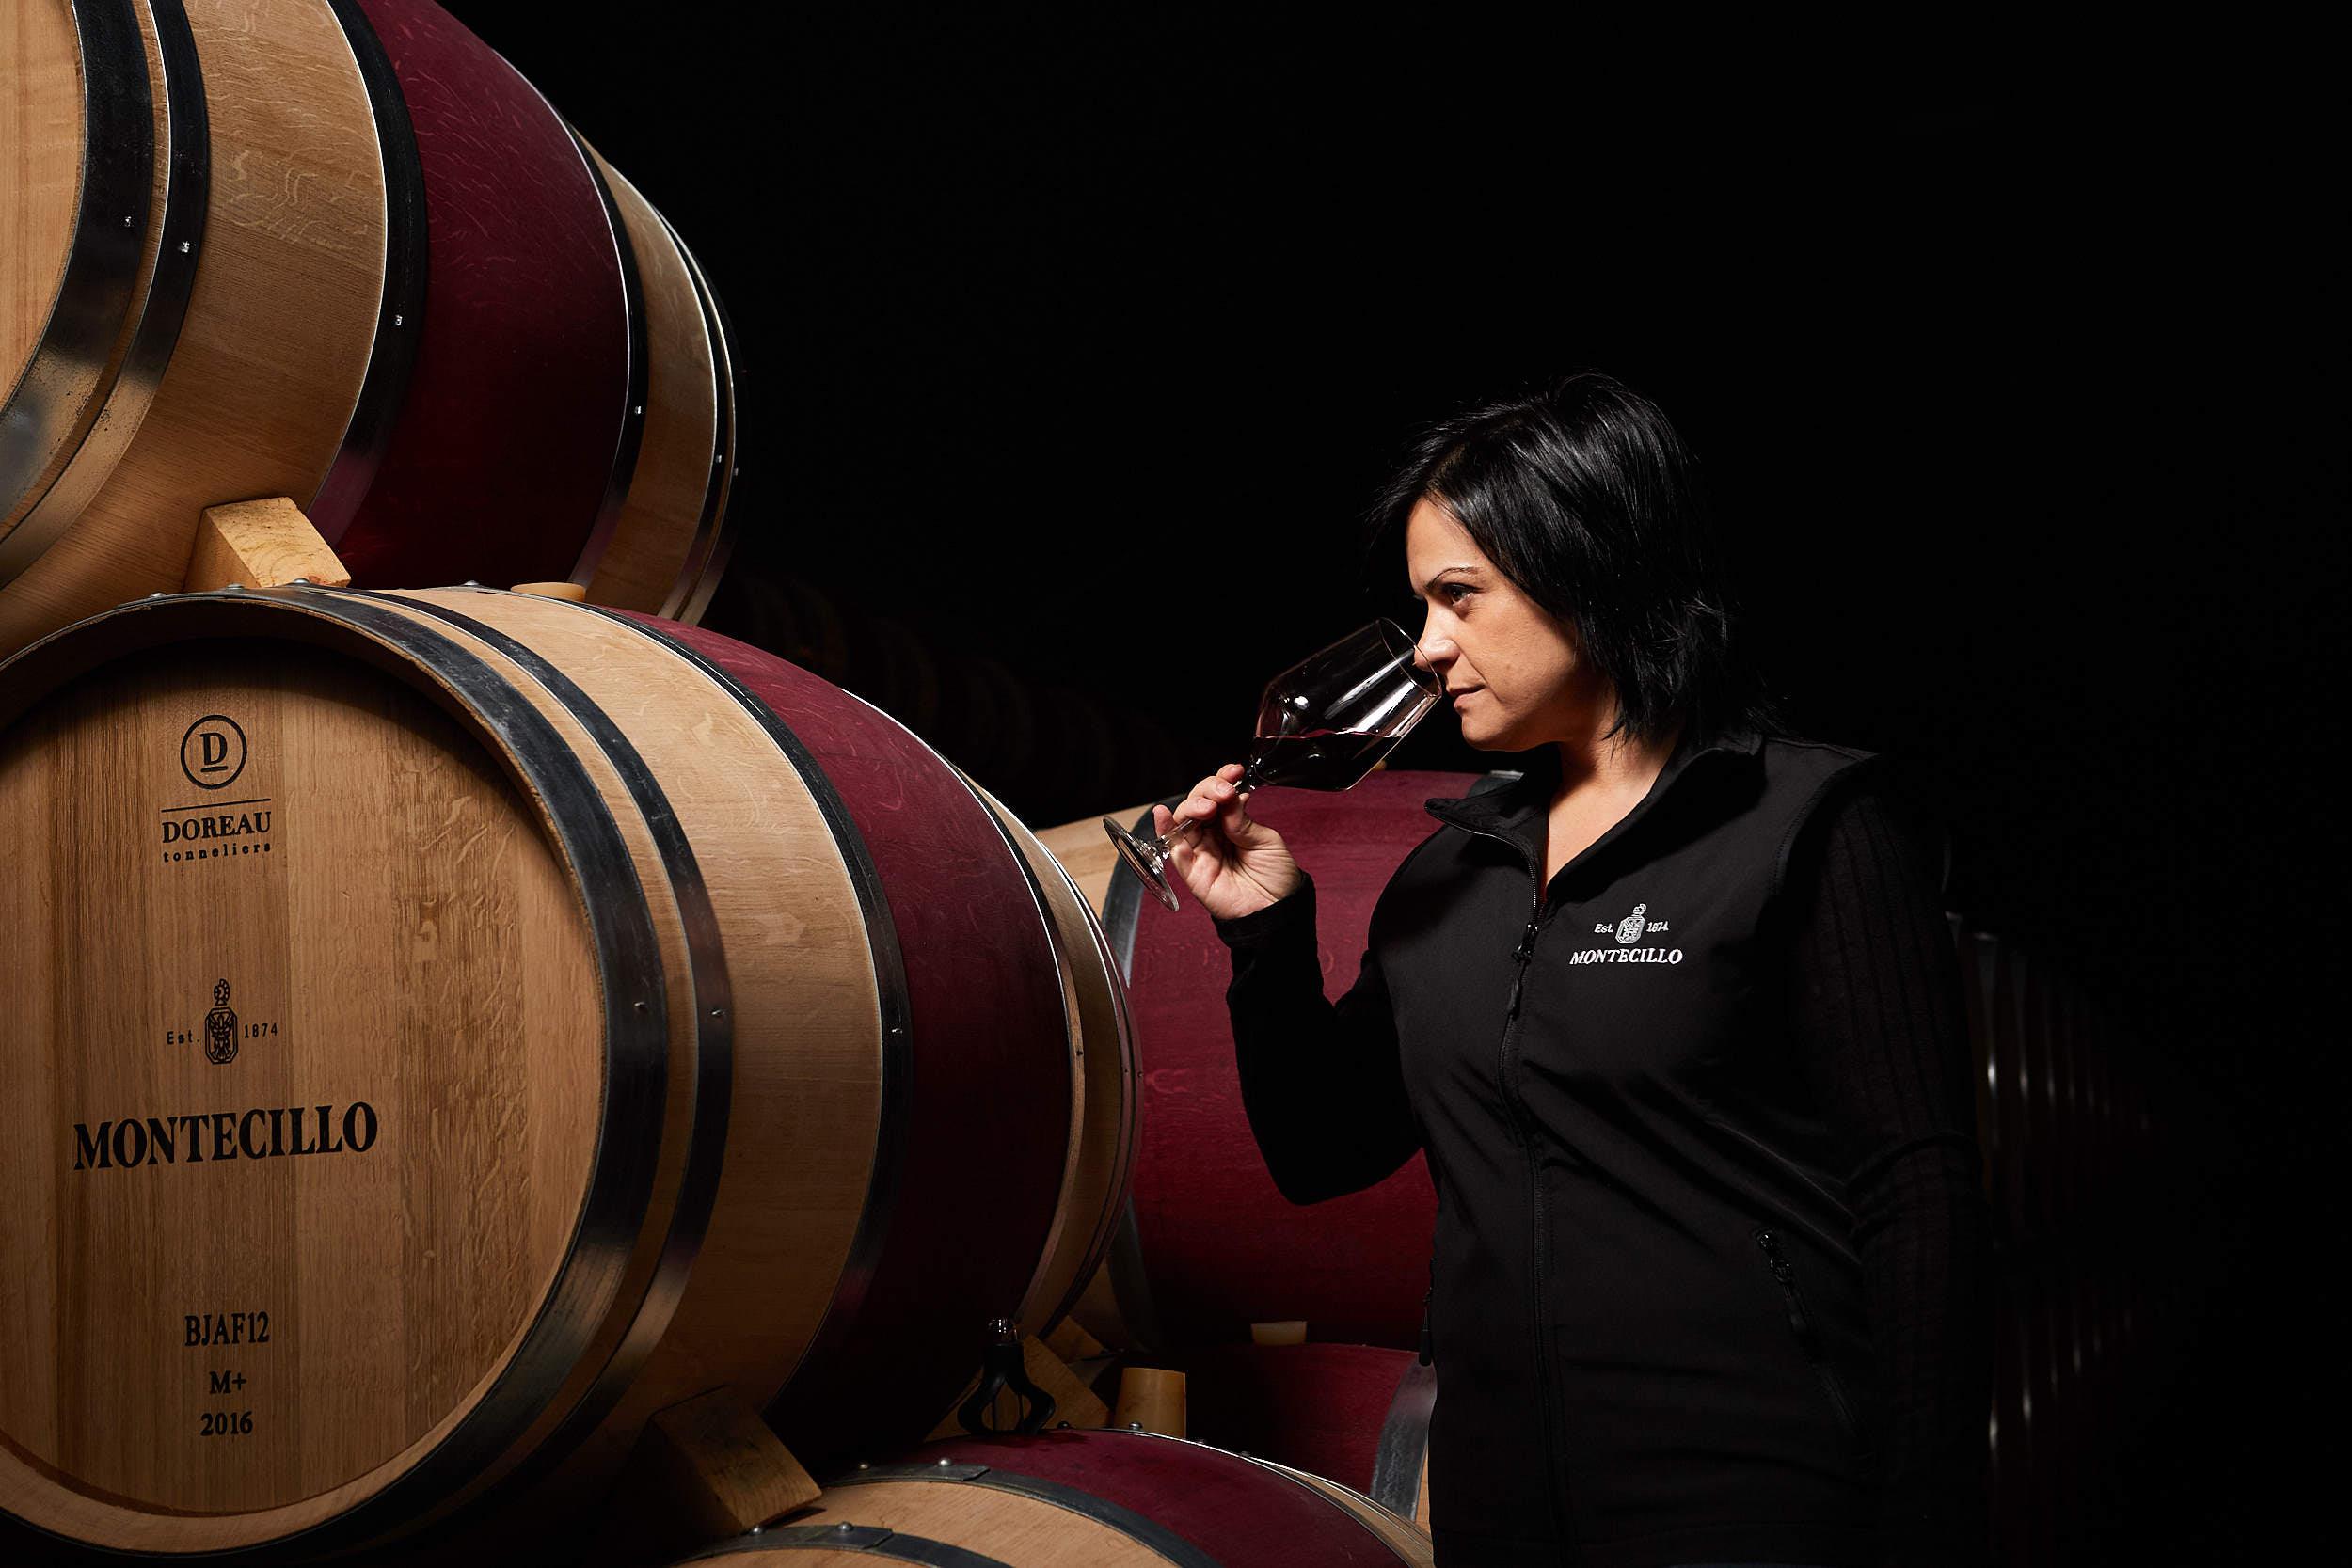 1612Bodegas_Montecillo_Wine_Photography_La_Rioja_Spain_James_Sturcke_sturcke.org_0009.jpg